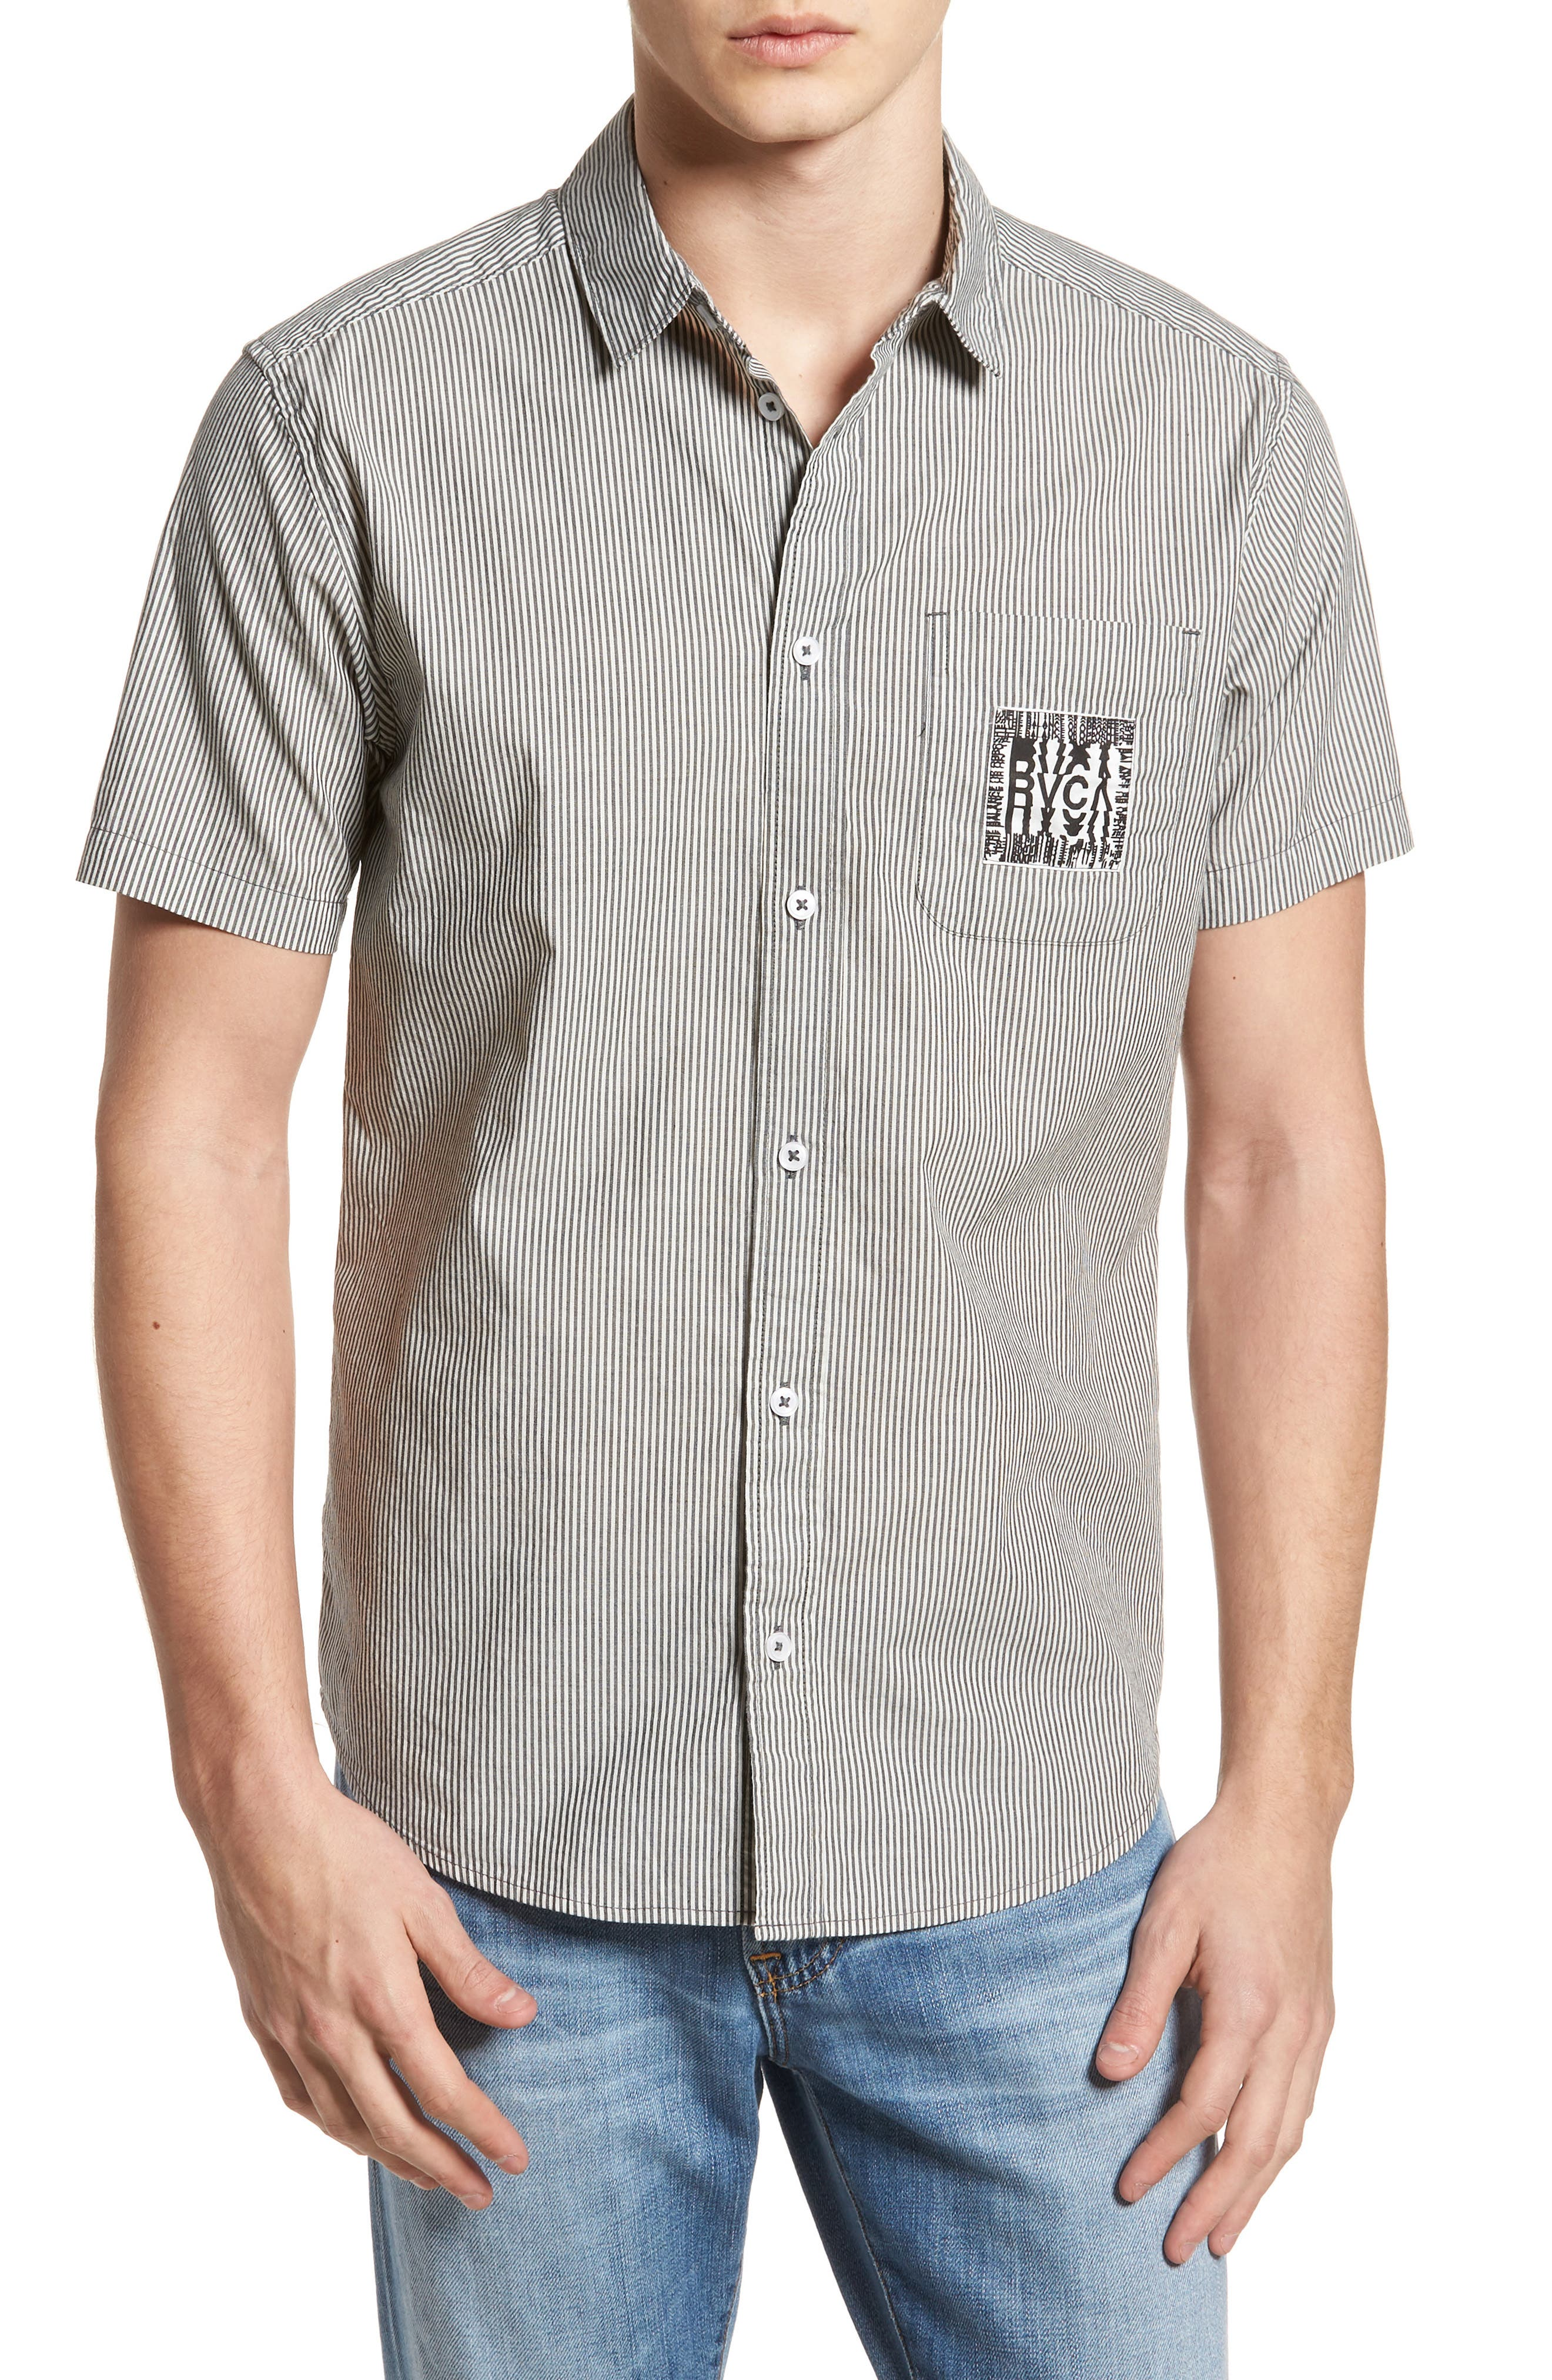 RVCA resort Disruption Woven Shirt